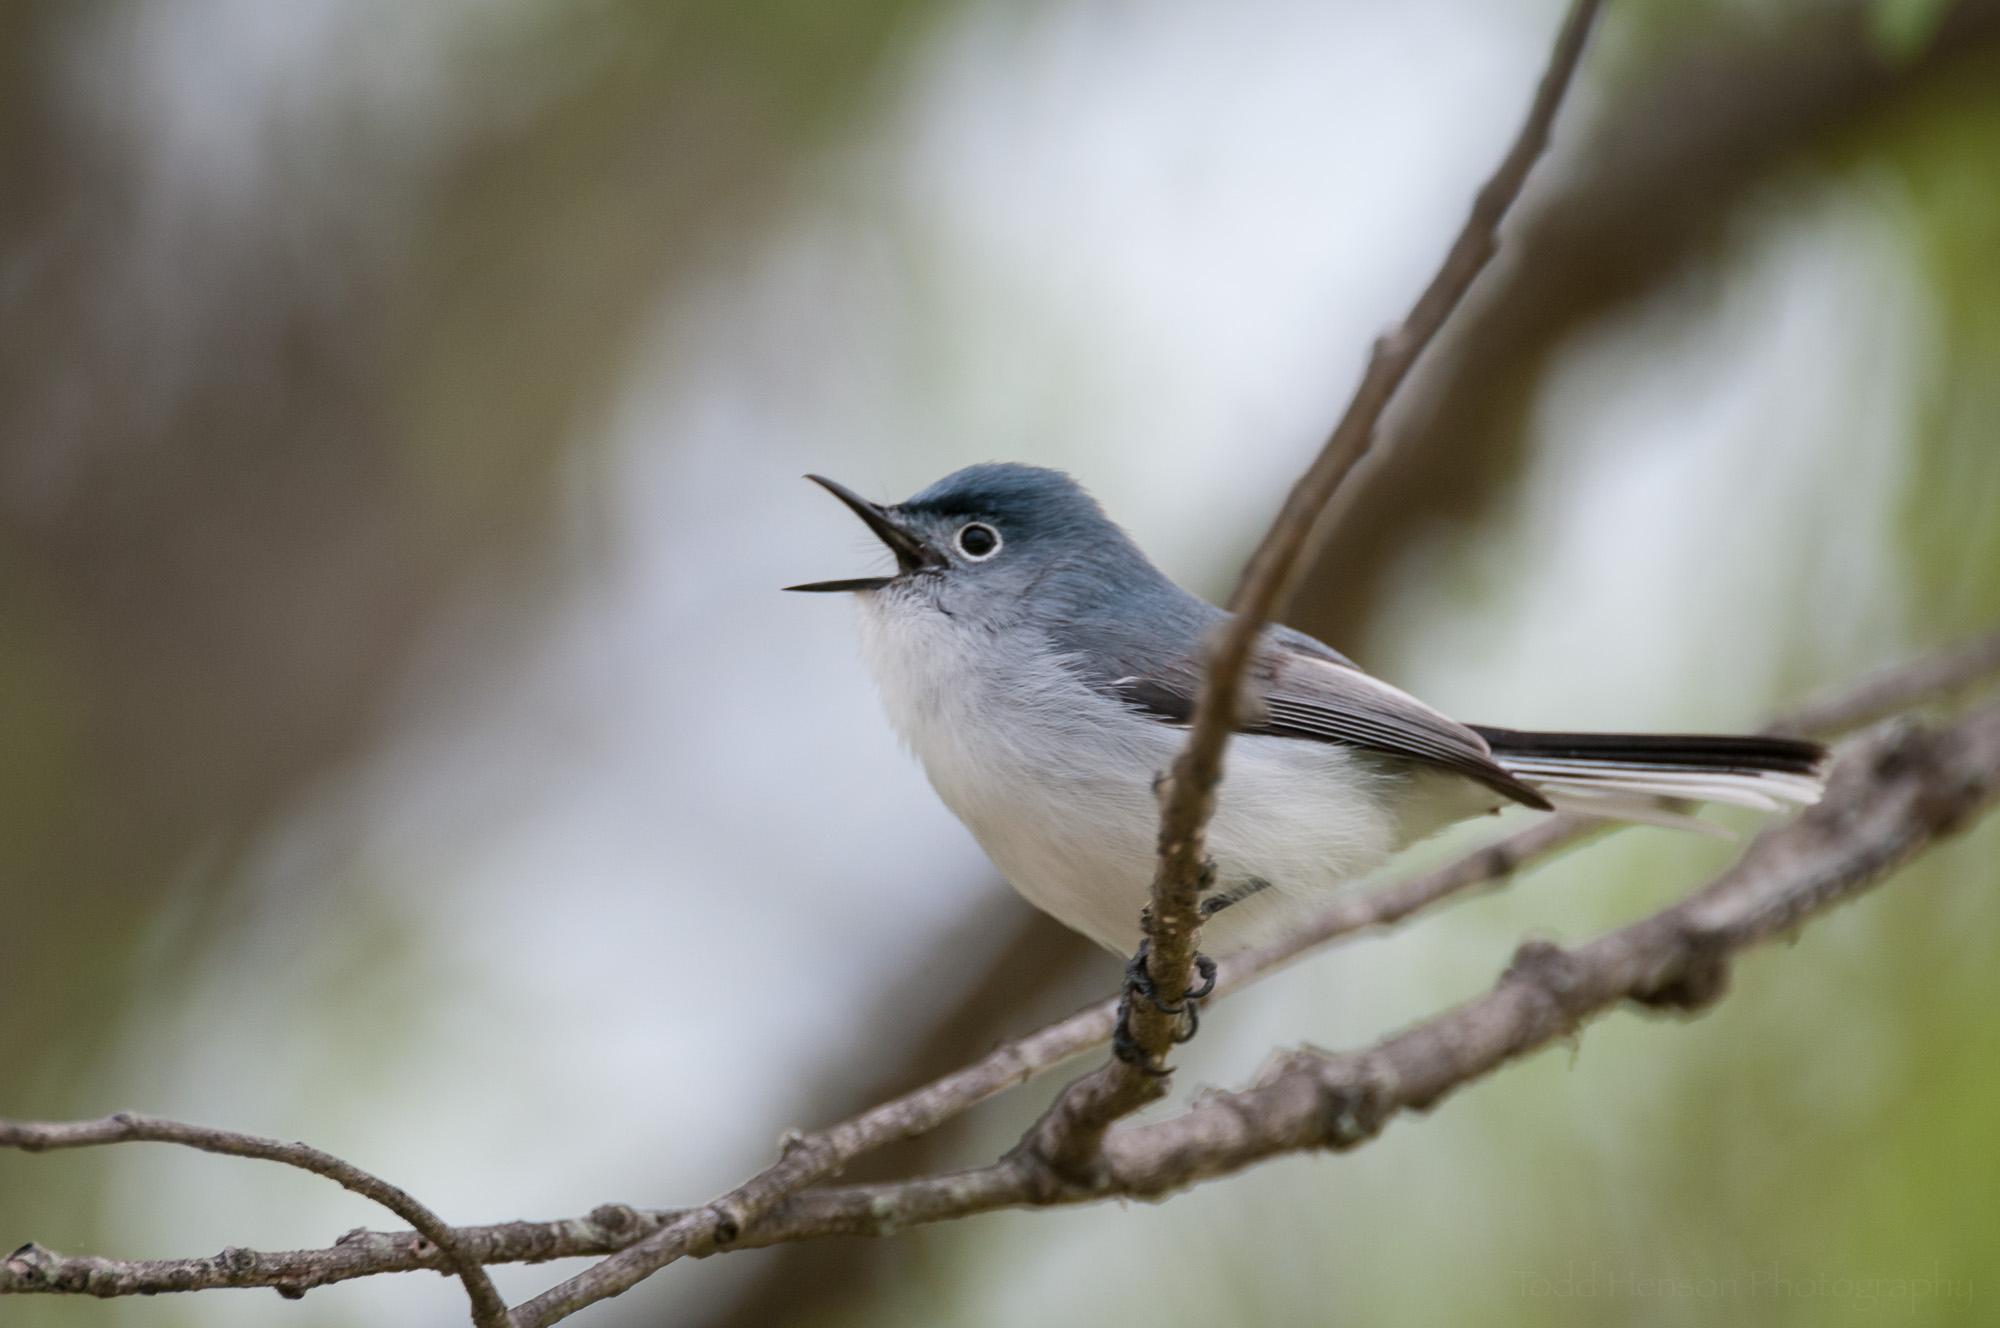 Male Blue-Gray Gnatcatcher singing